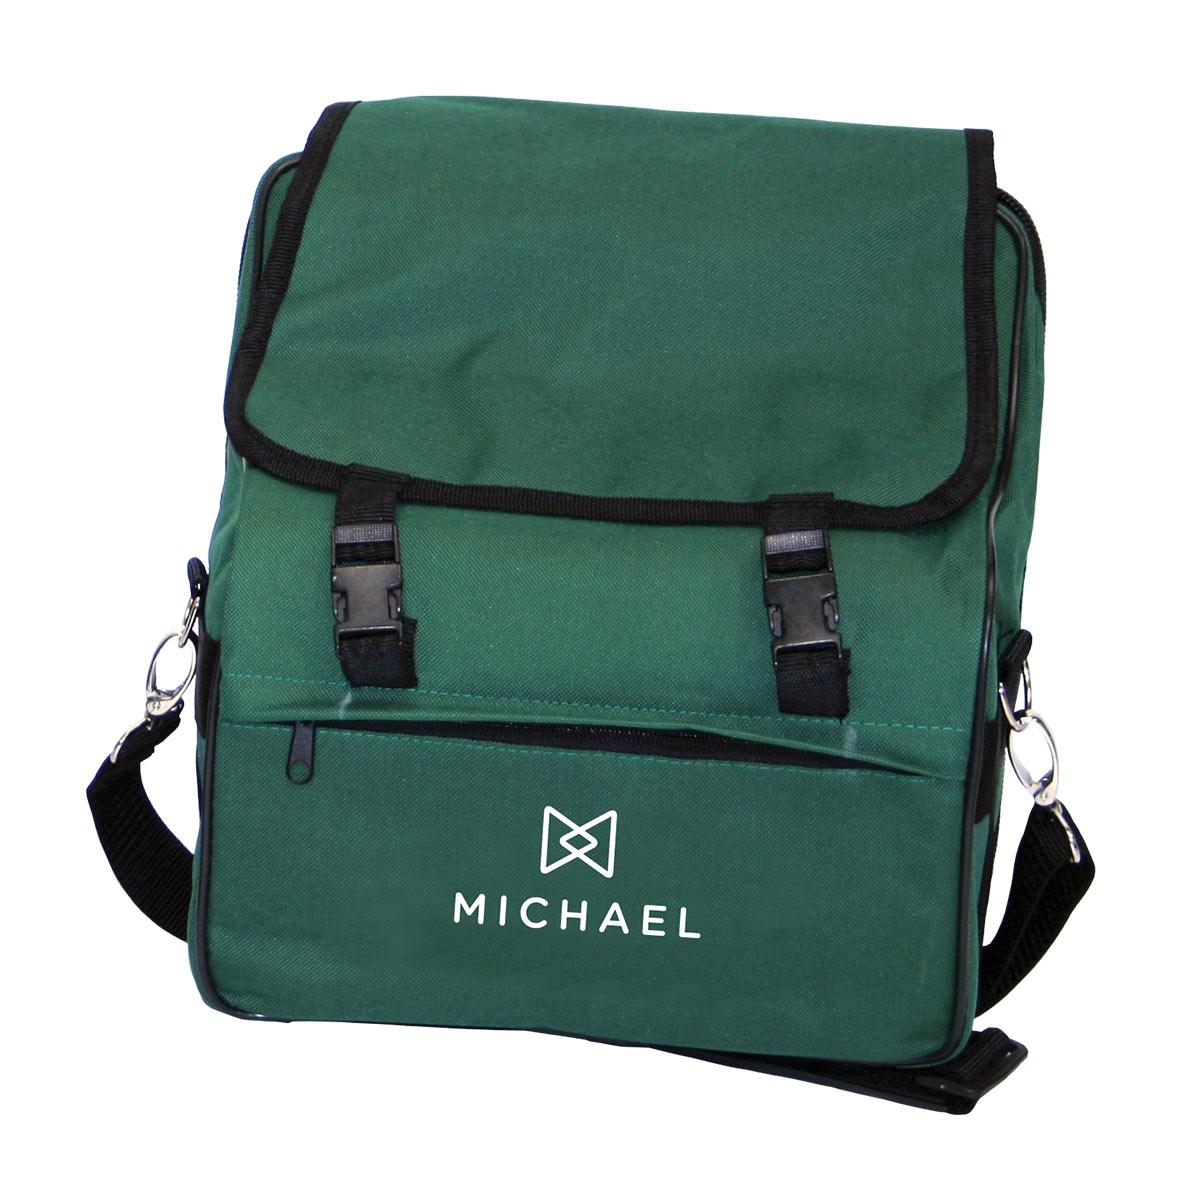 Acordeon de 8 Baixos - ACM 0822 PRD Michael